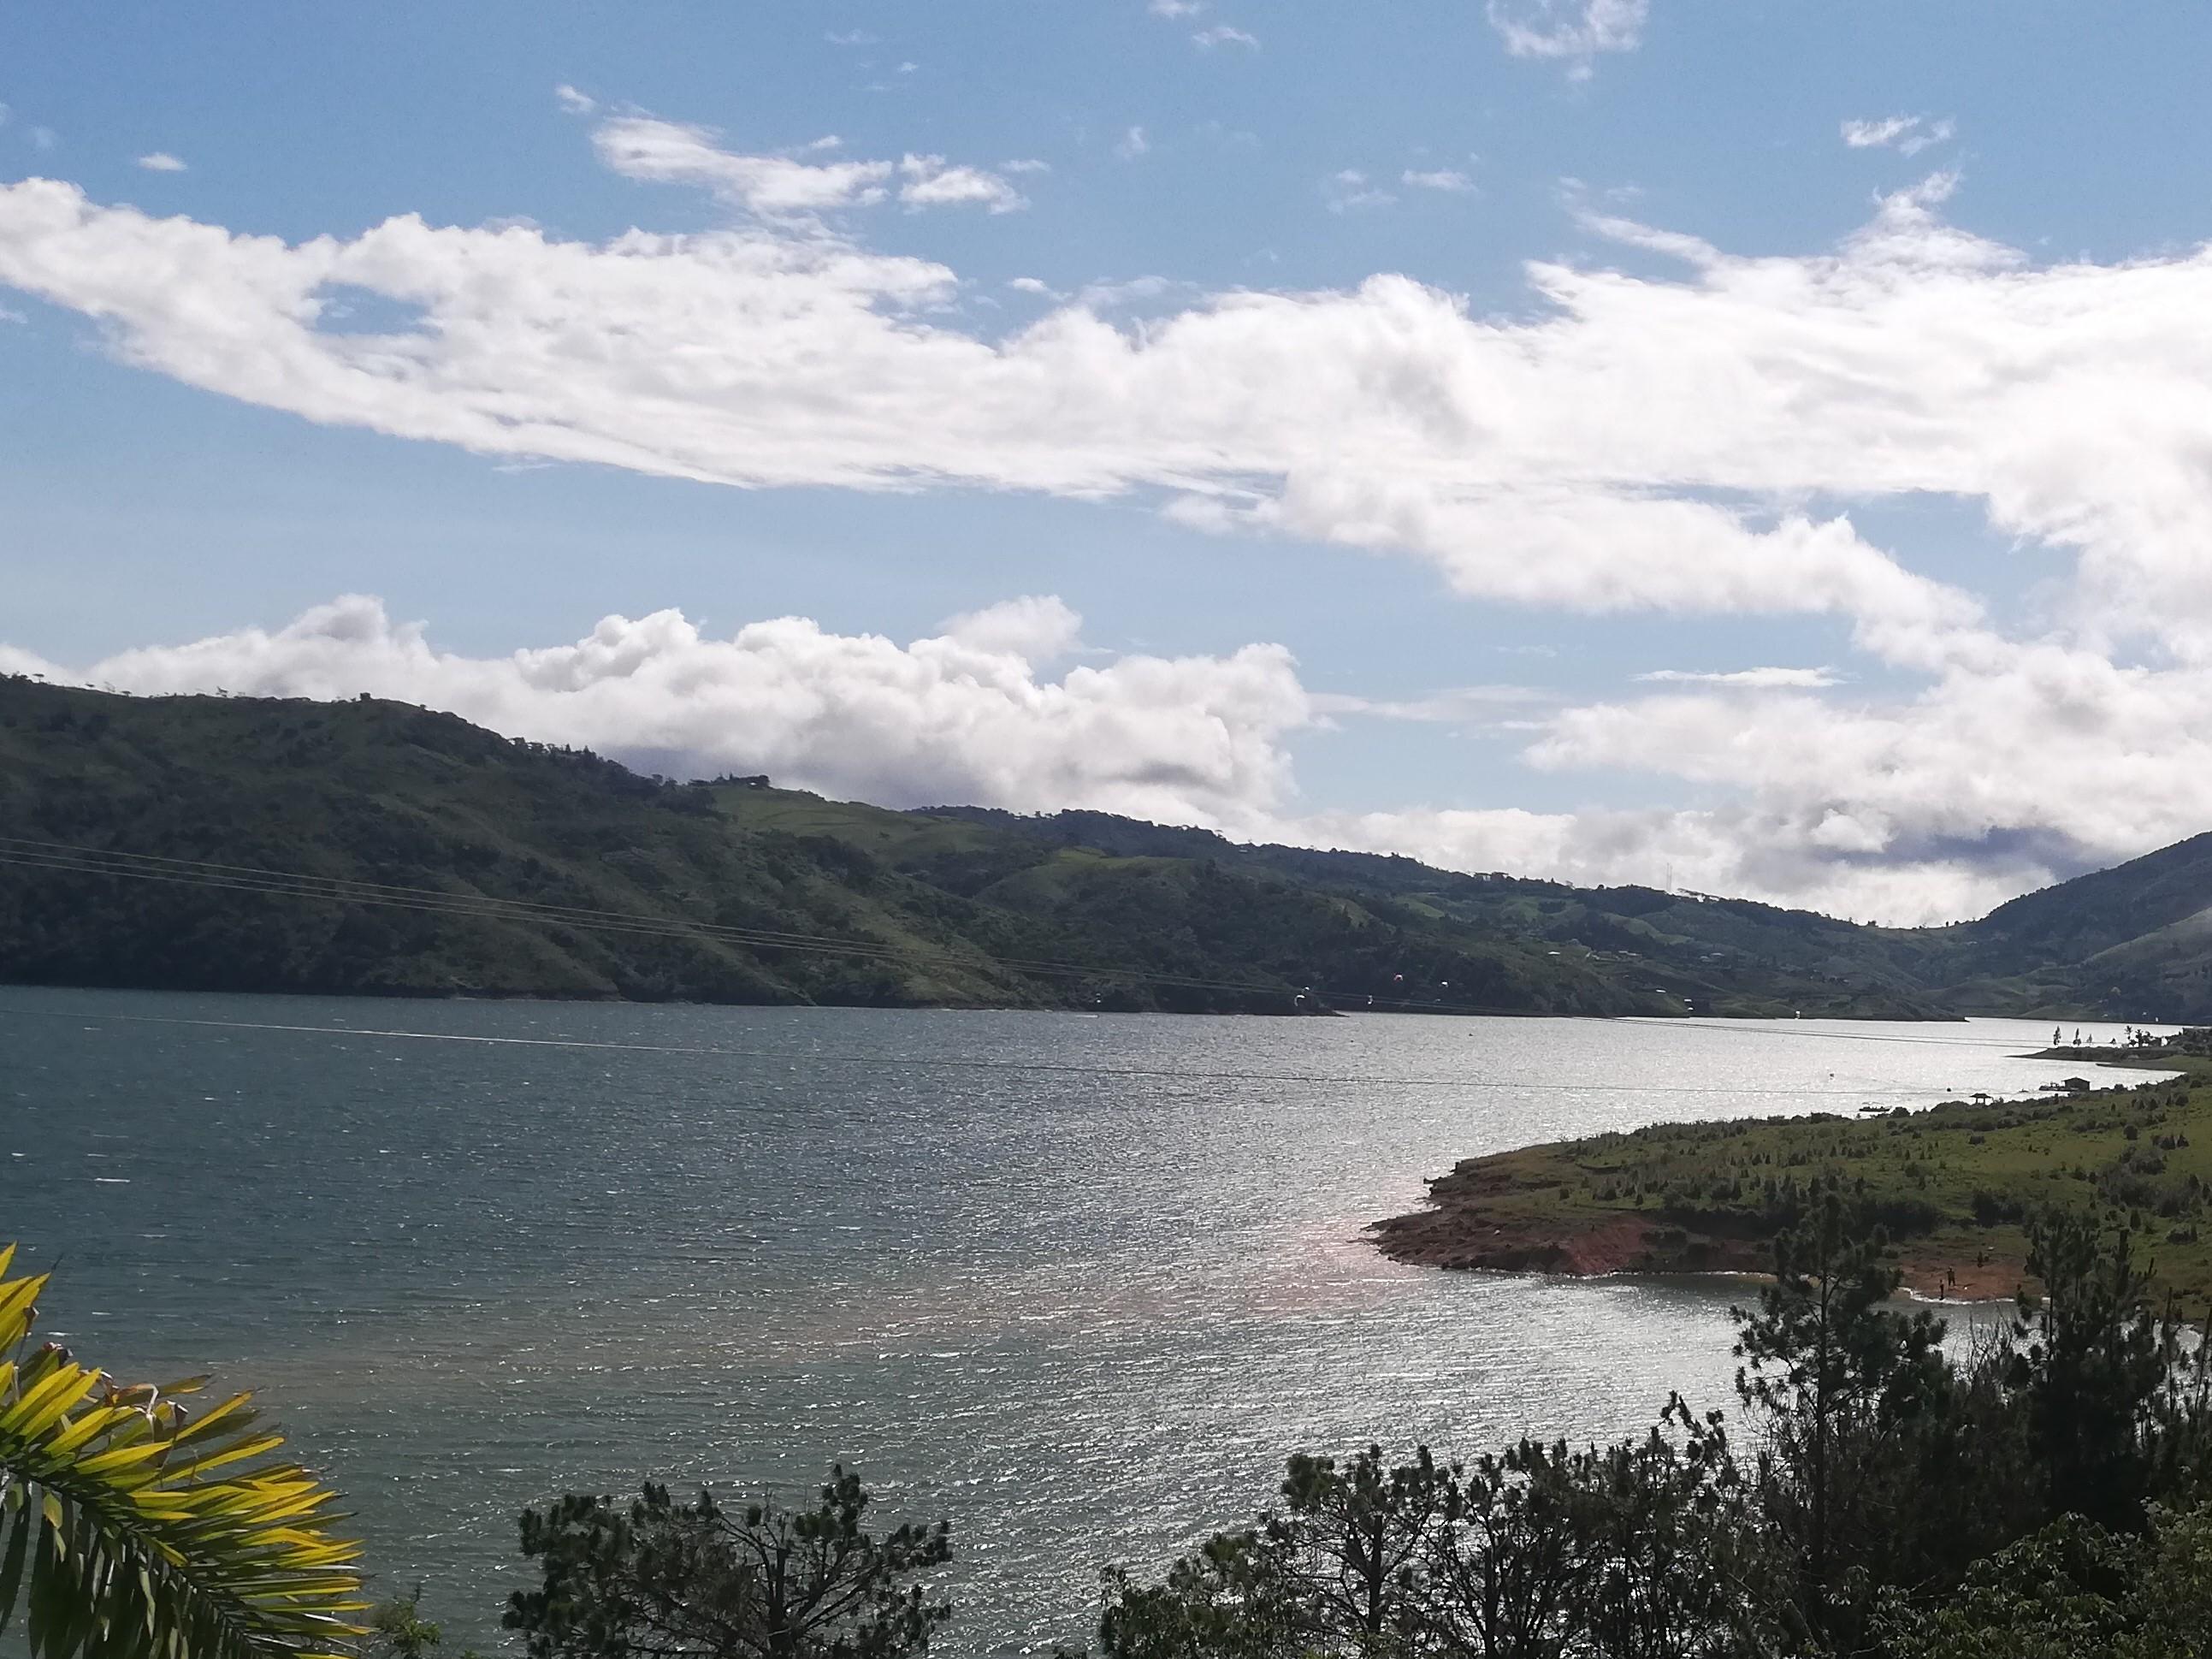 La represa de Calima y la Casa Perini, un destino compartido